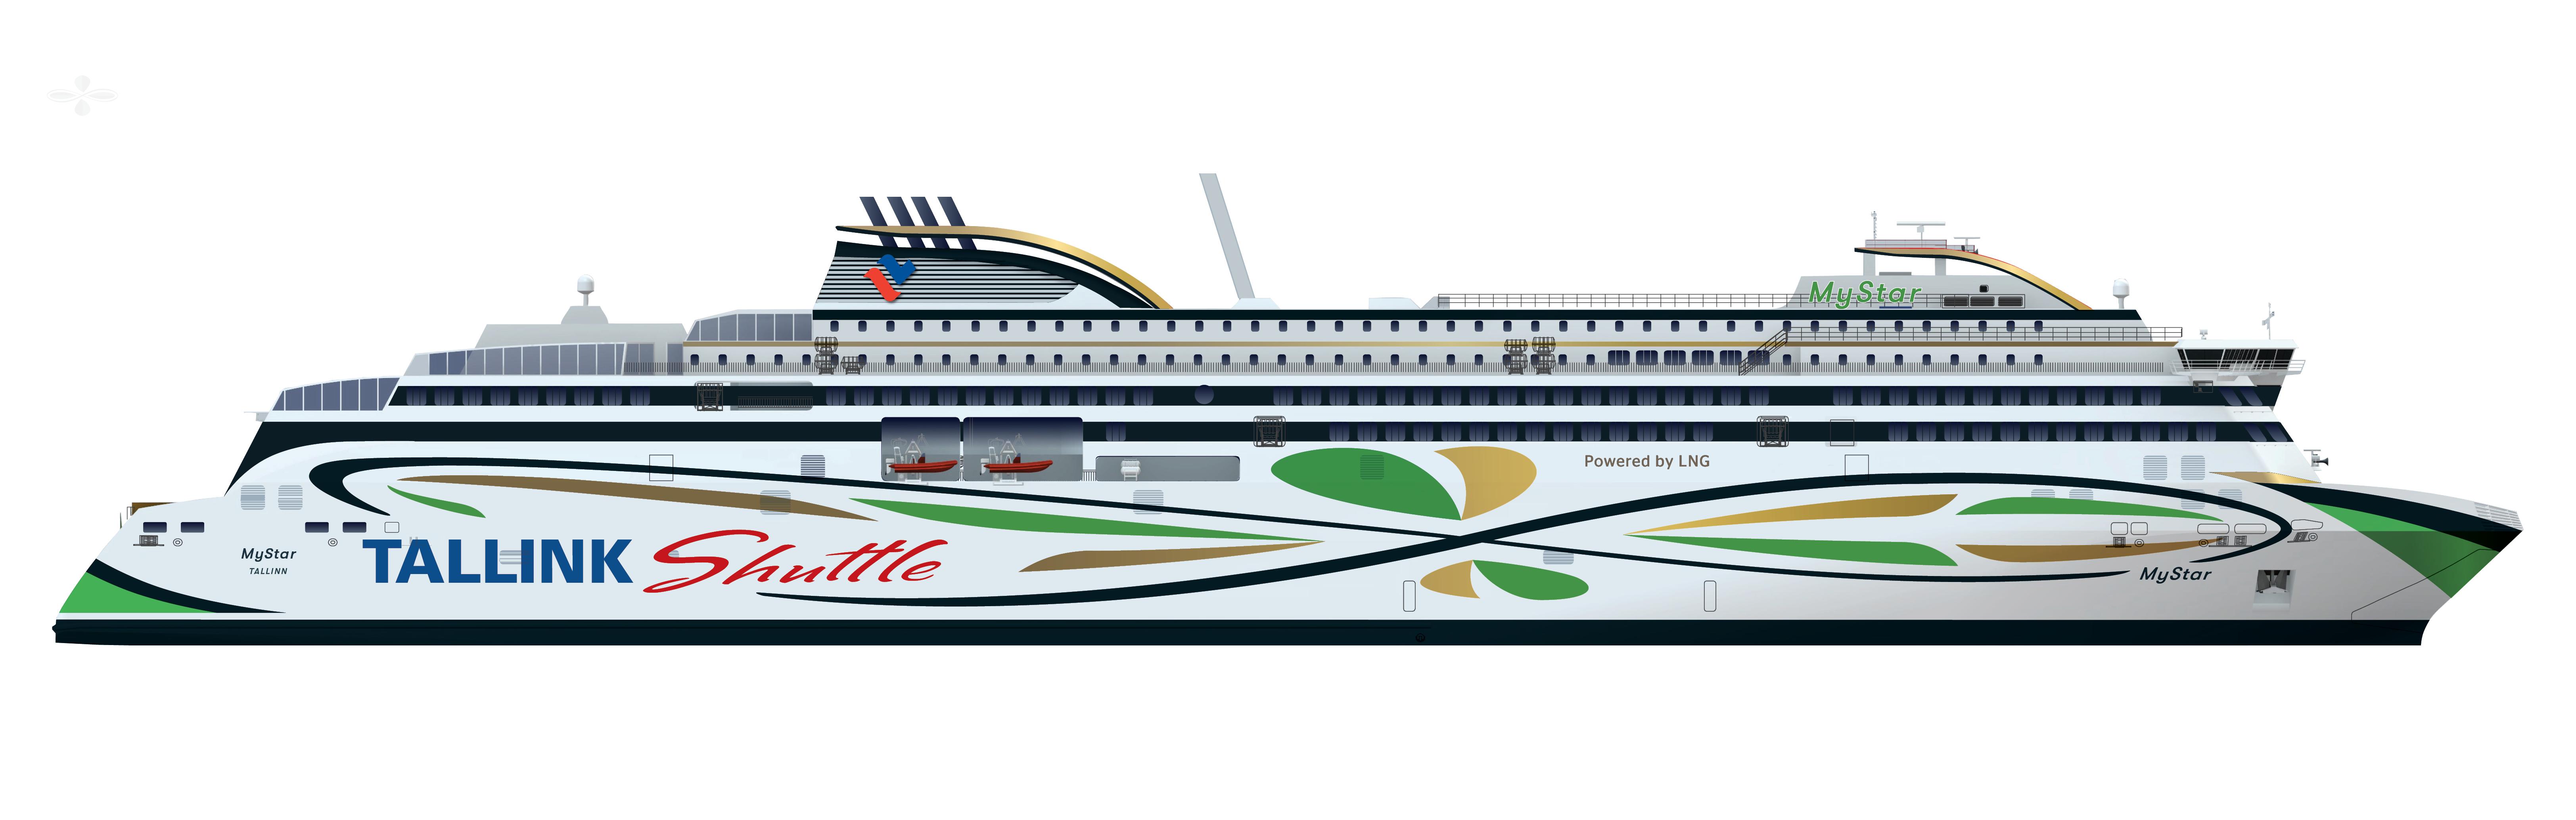 Tallink_Silja_MyStar_Aussenansicht2